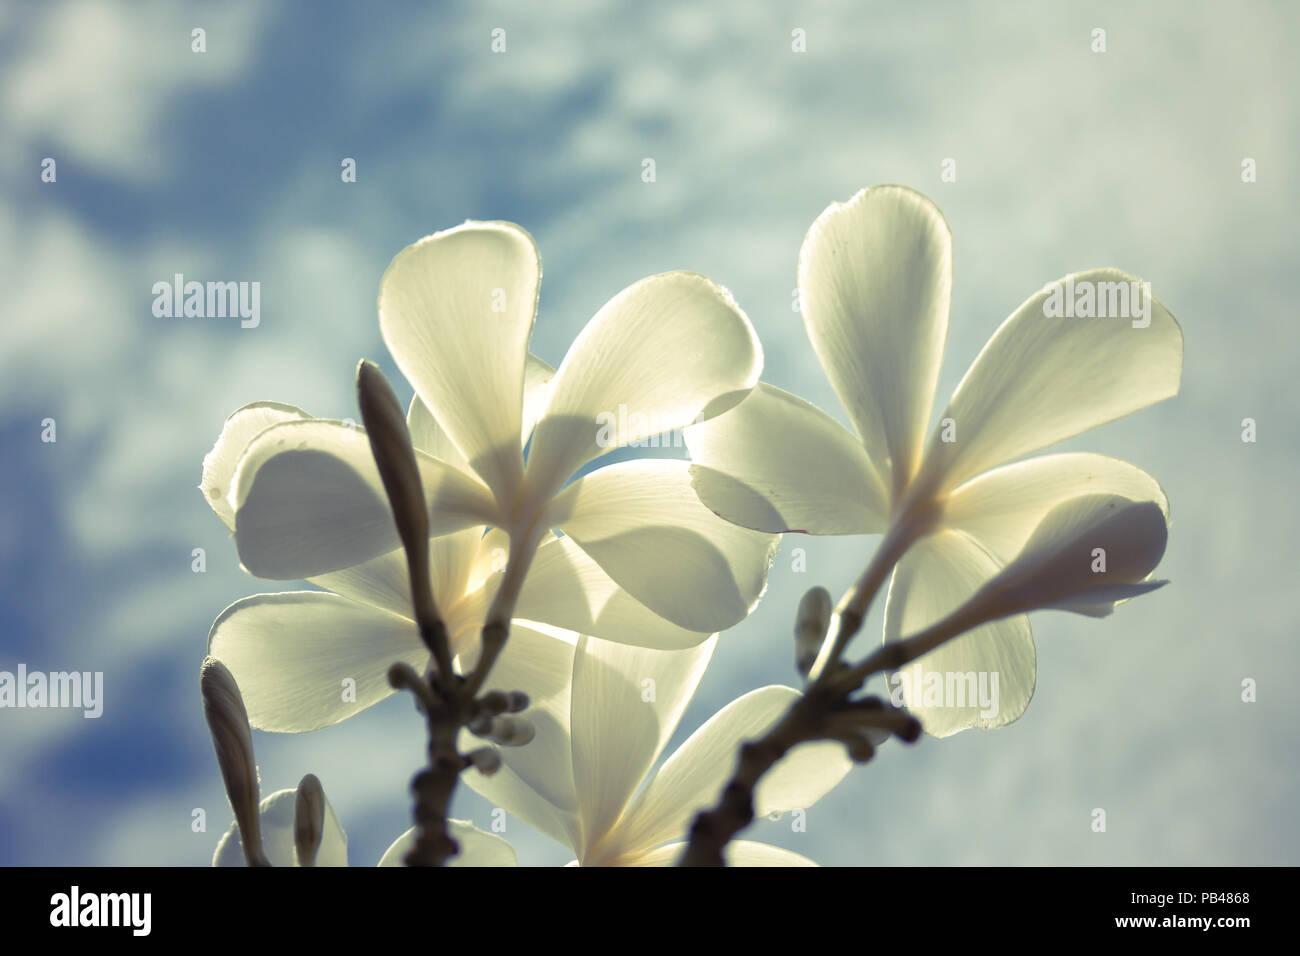 Vintage effect style of white plumeria flowers with blue sky vintage effect style of white plumeria flowers with blue sky center focus image izmirmasajfo